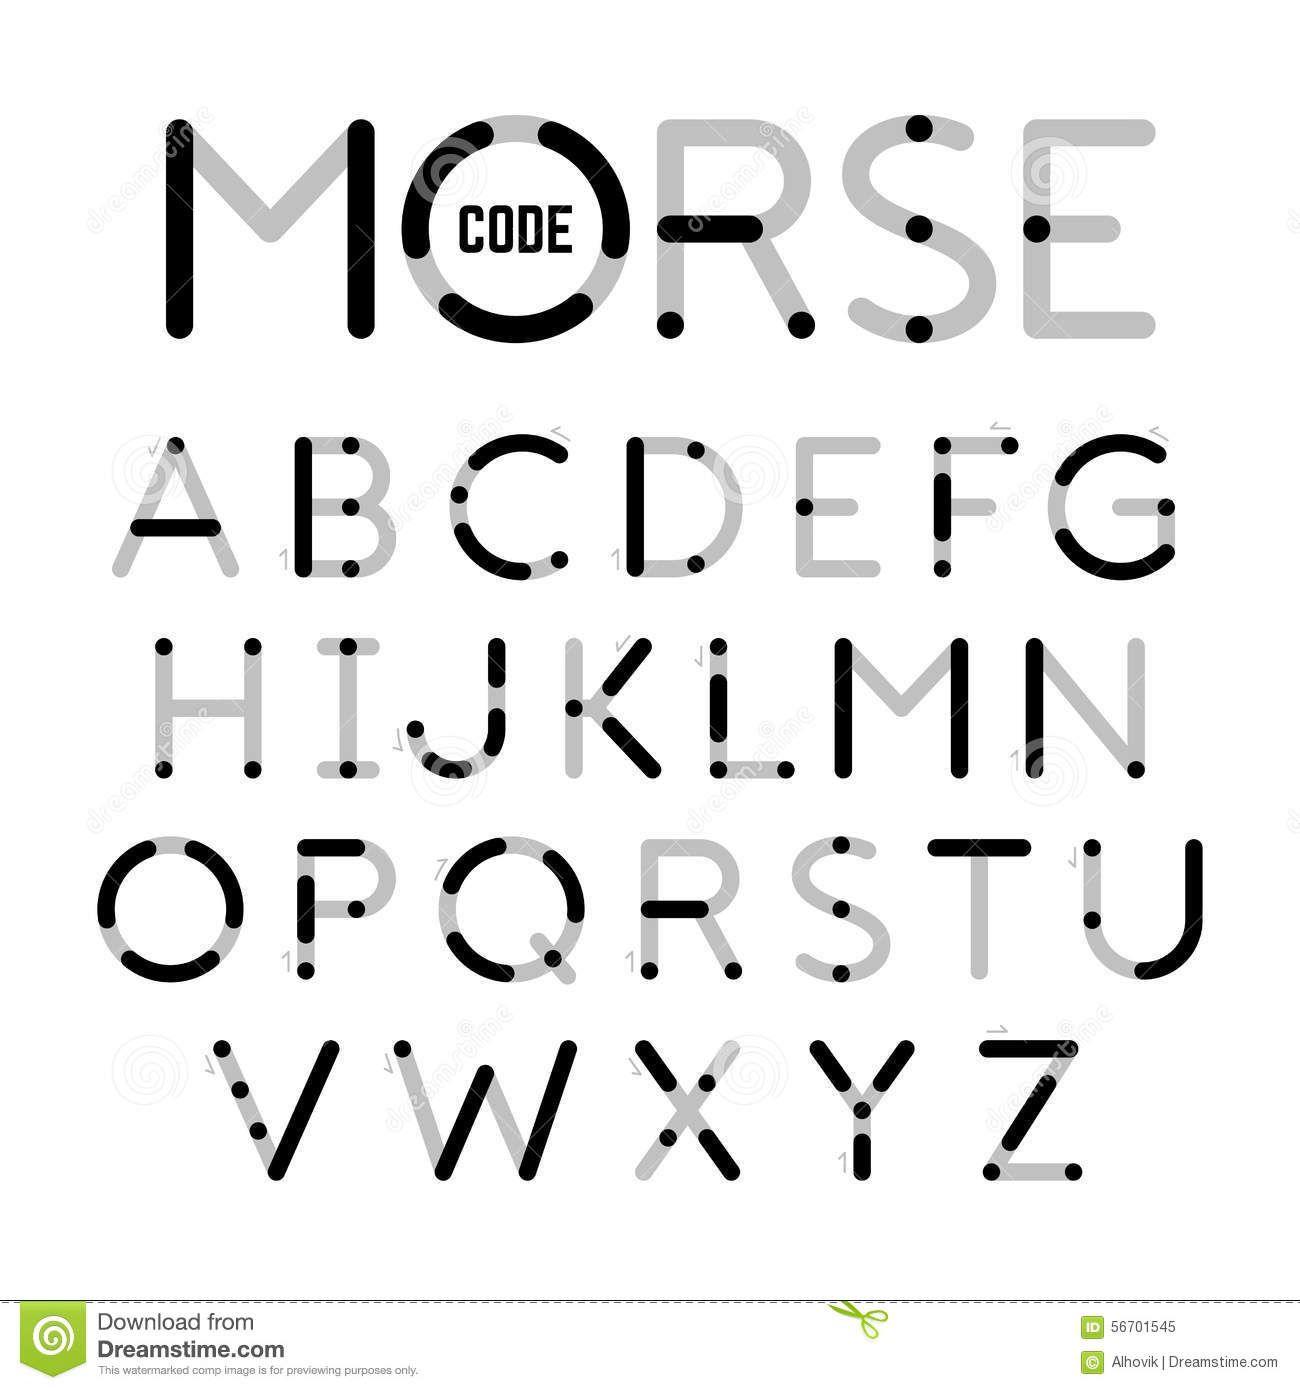 Worksheets Morse Code Worksheet international morse code chart symbolisms pinterest and audio